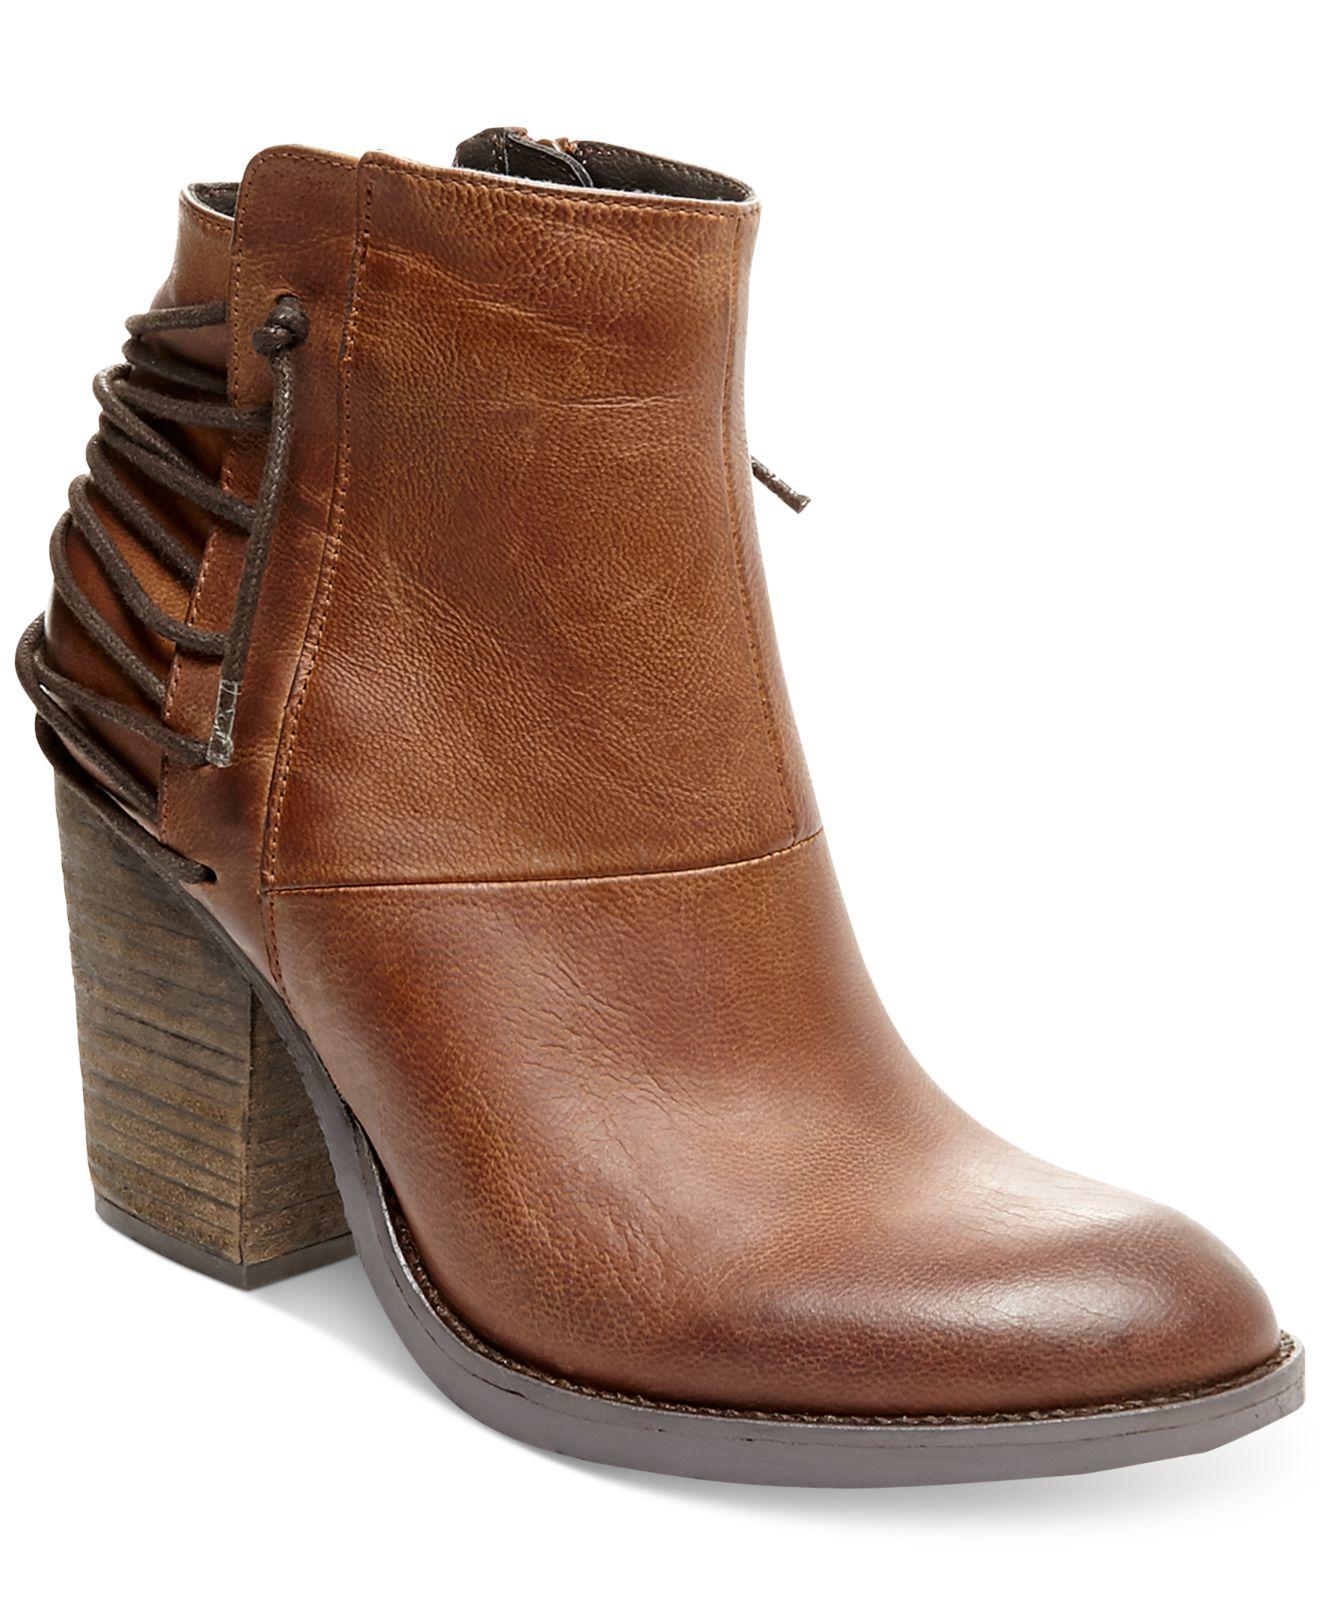 Macy S Jessica Simpson Shoes